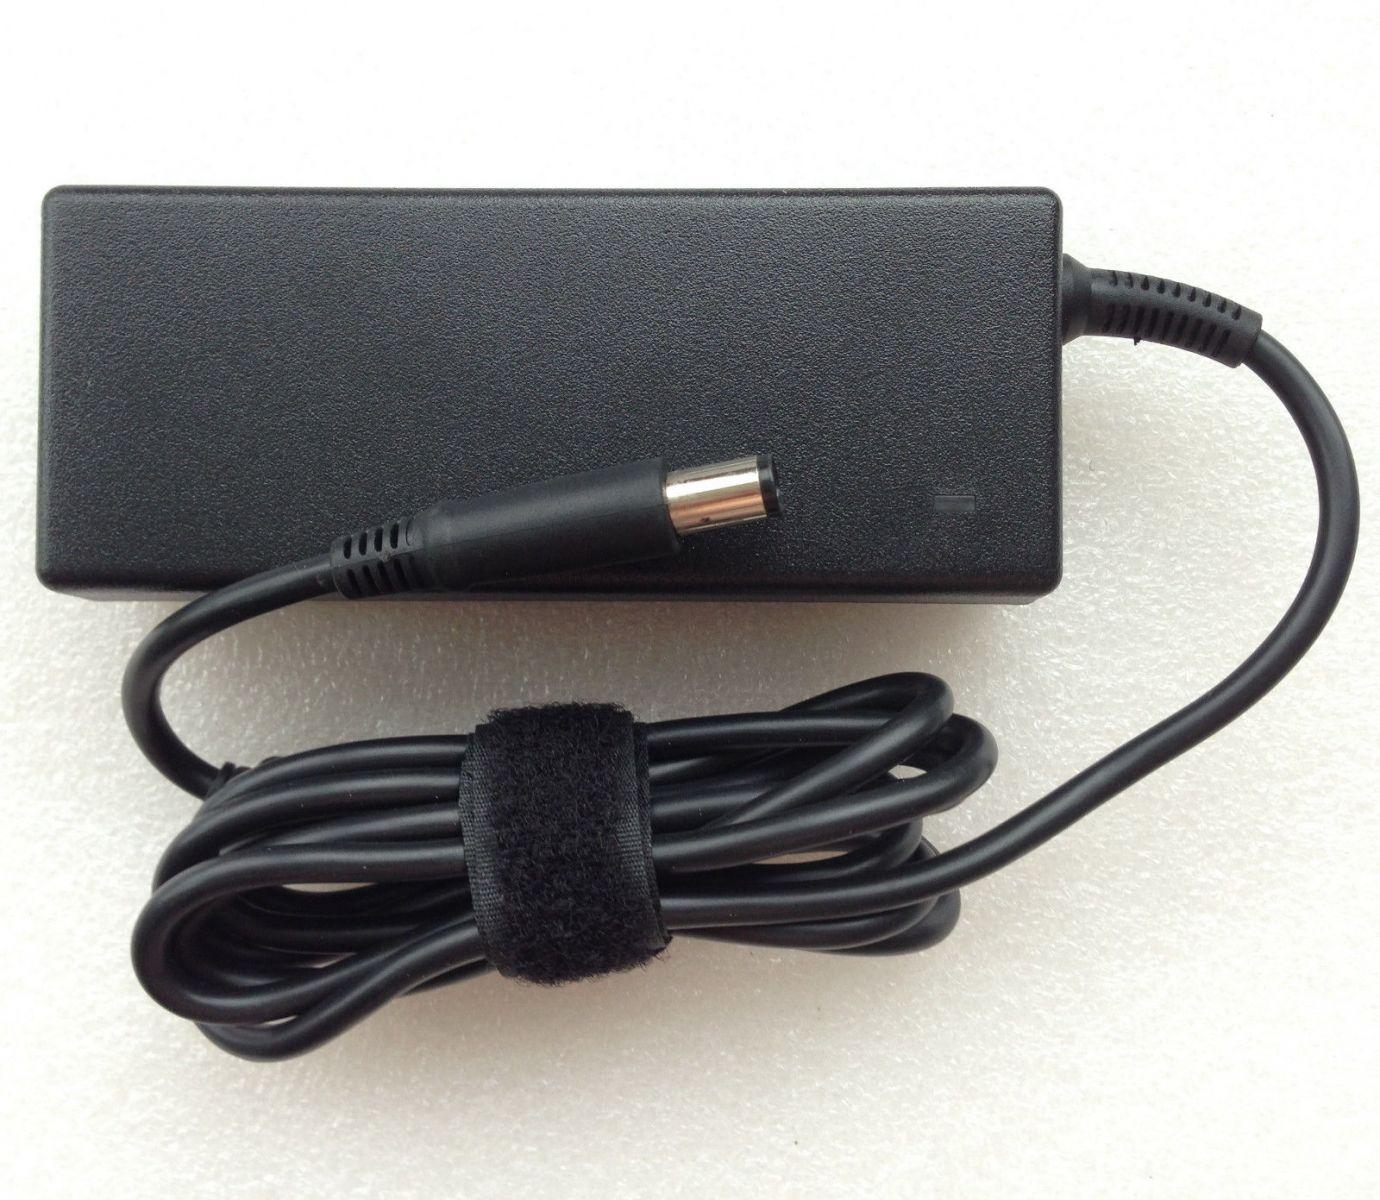 Sạc cho laptop Dell Inspiron N4010 Adapter 19.5V-3.34A, 19.5V-4.62A